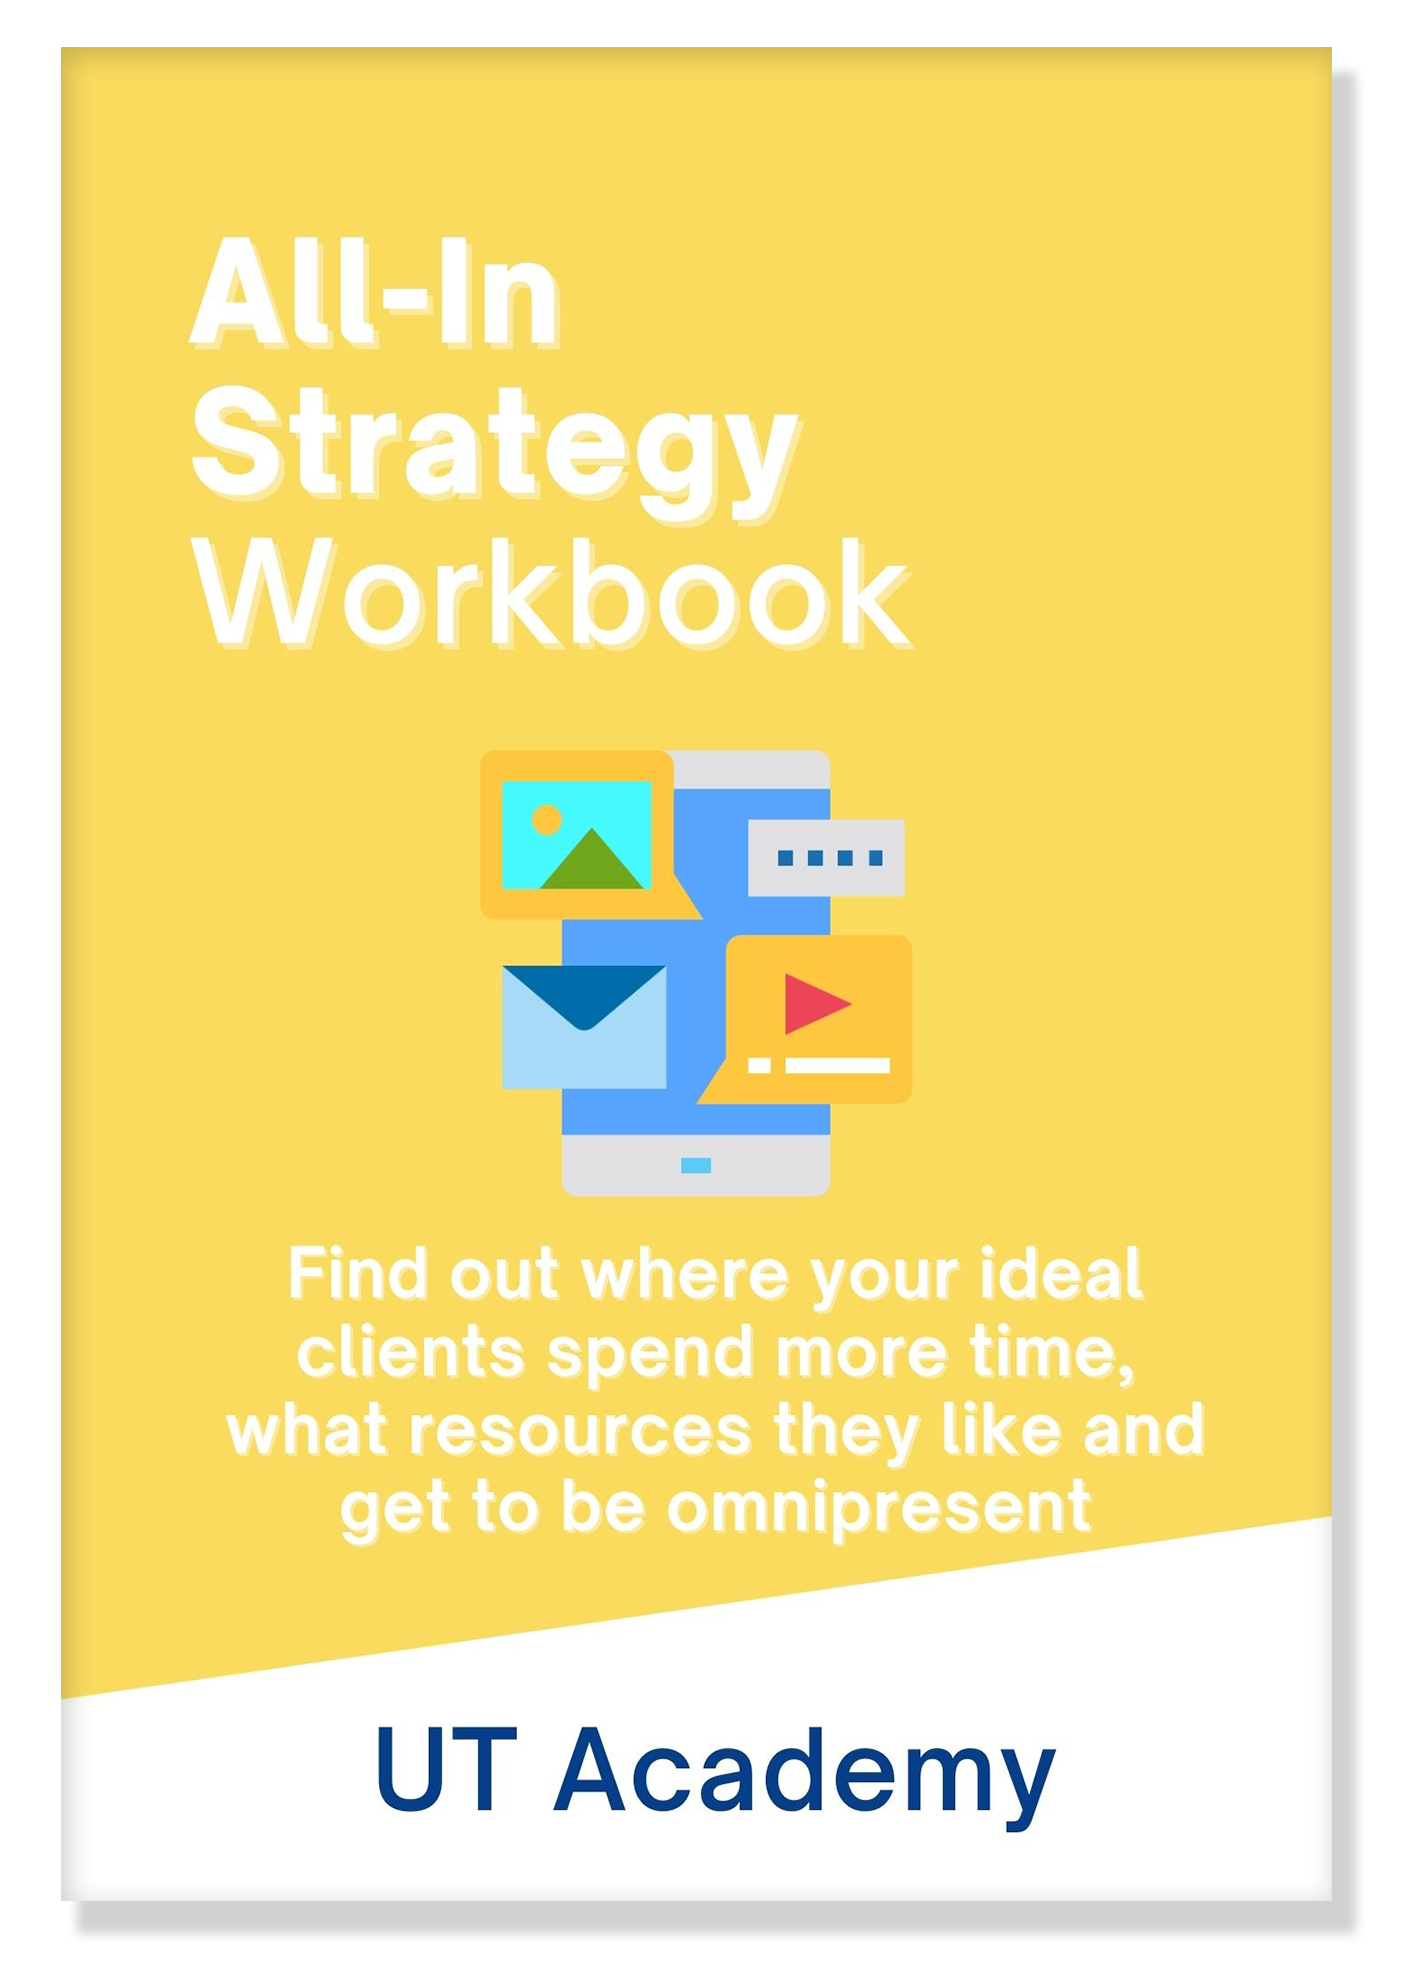 All-in-Workbook